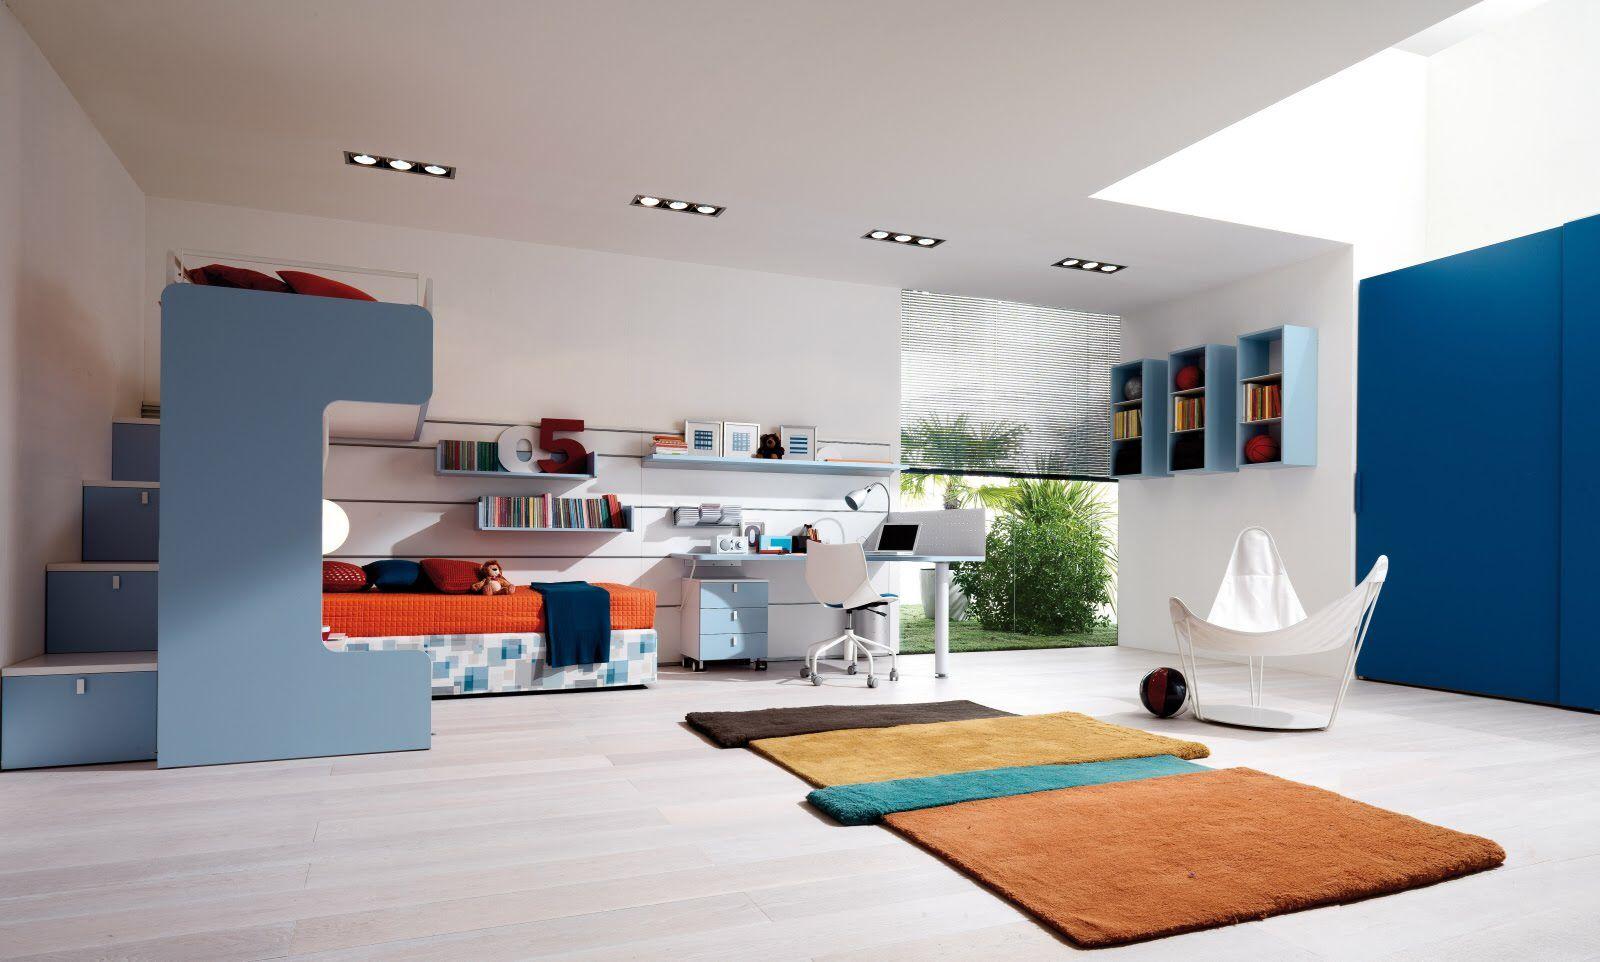 Teenage Room Furniture Dormitorio Juvenil Moderno  Dormitorios Juveniles Modernos